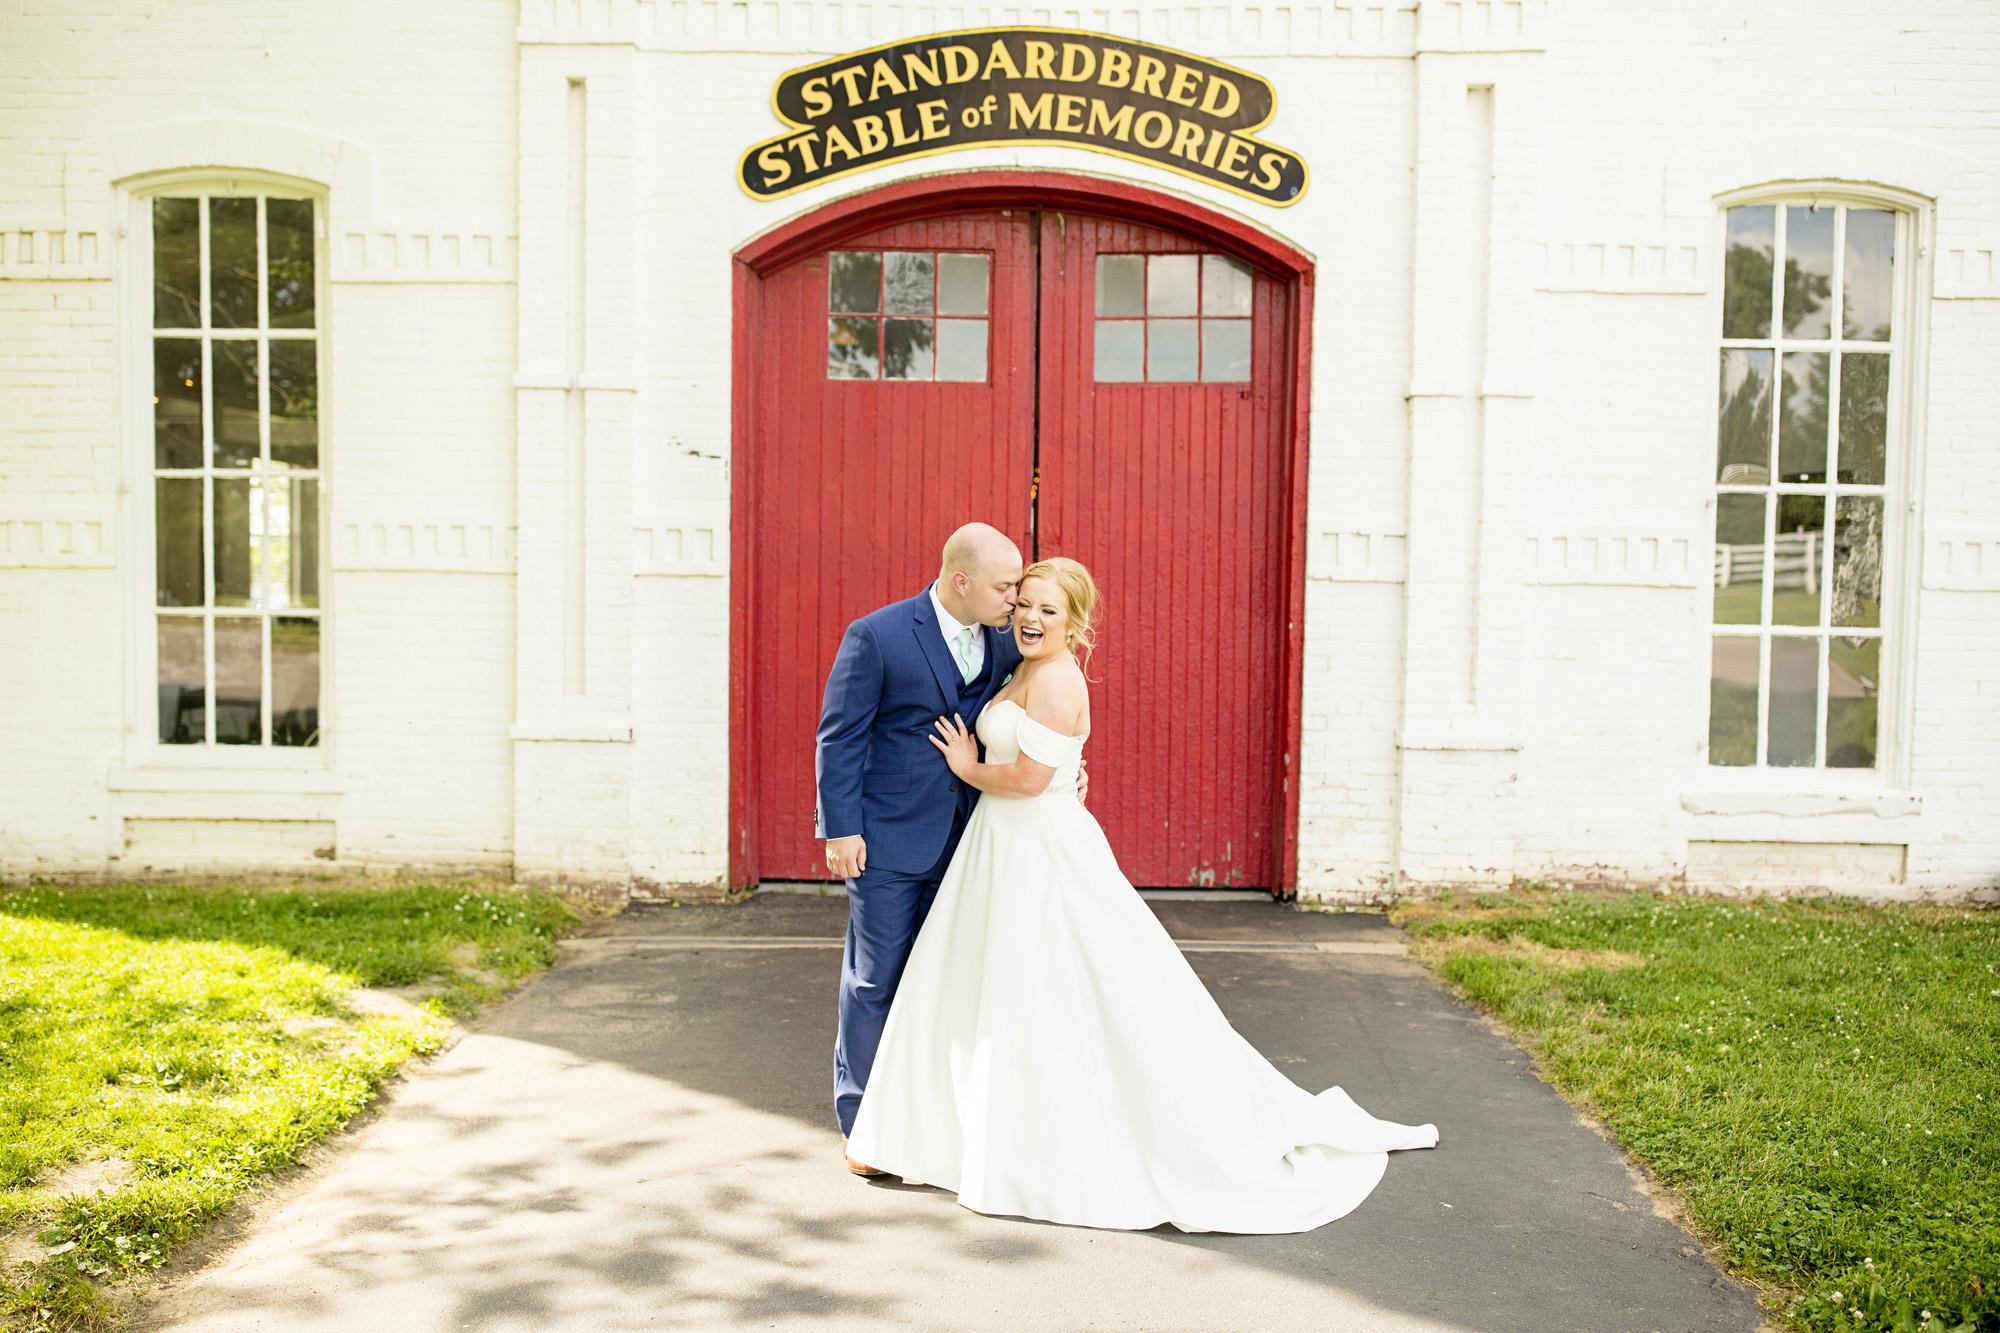 Seriously_Sabrina_Photography_Lexington_Kentucky_Pax_Christi_Round_Barn_Wedding_Beath_32.jpg